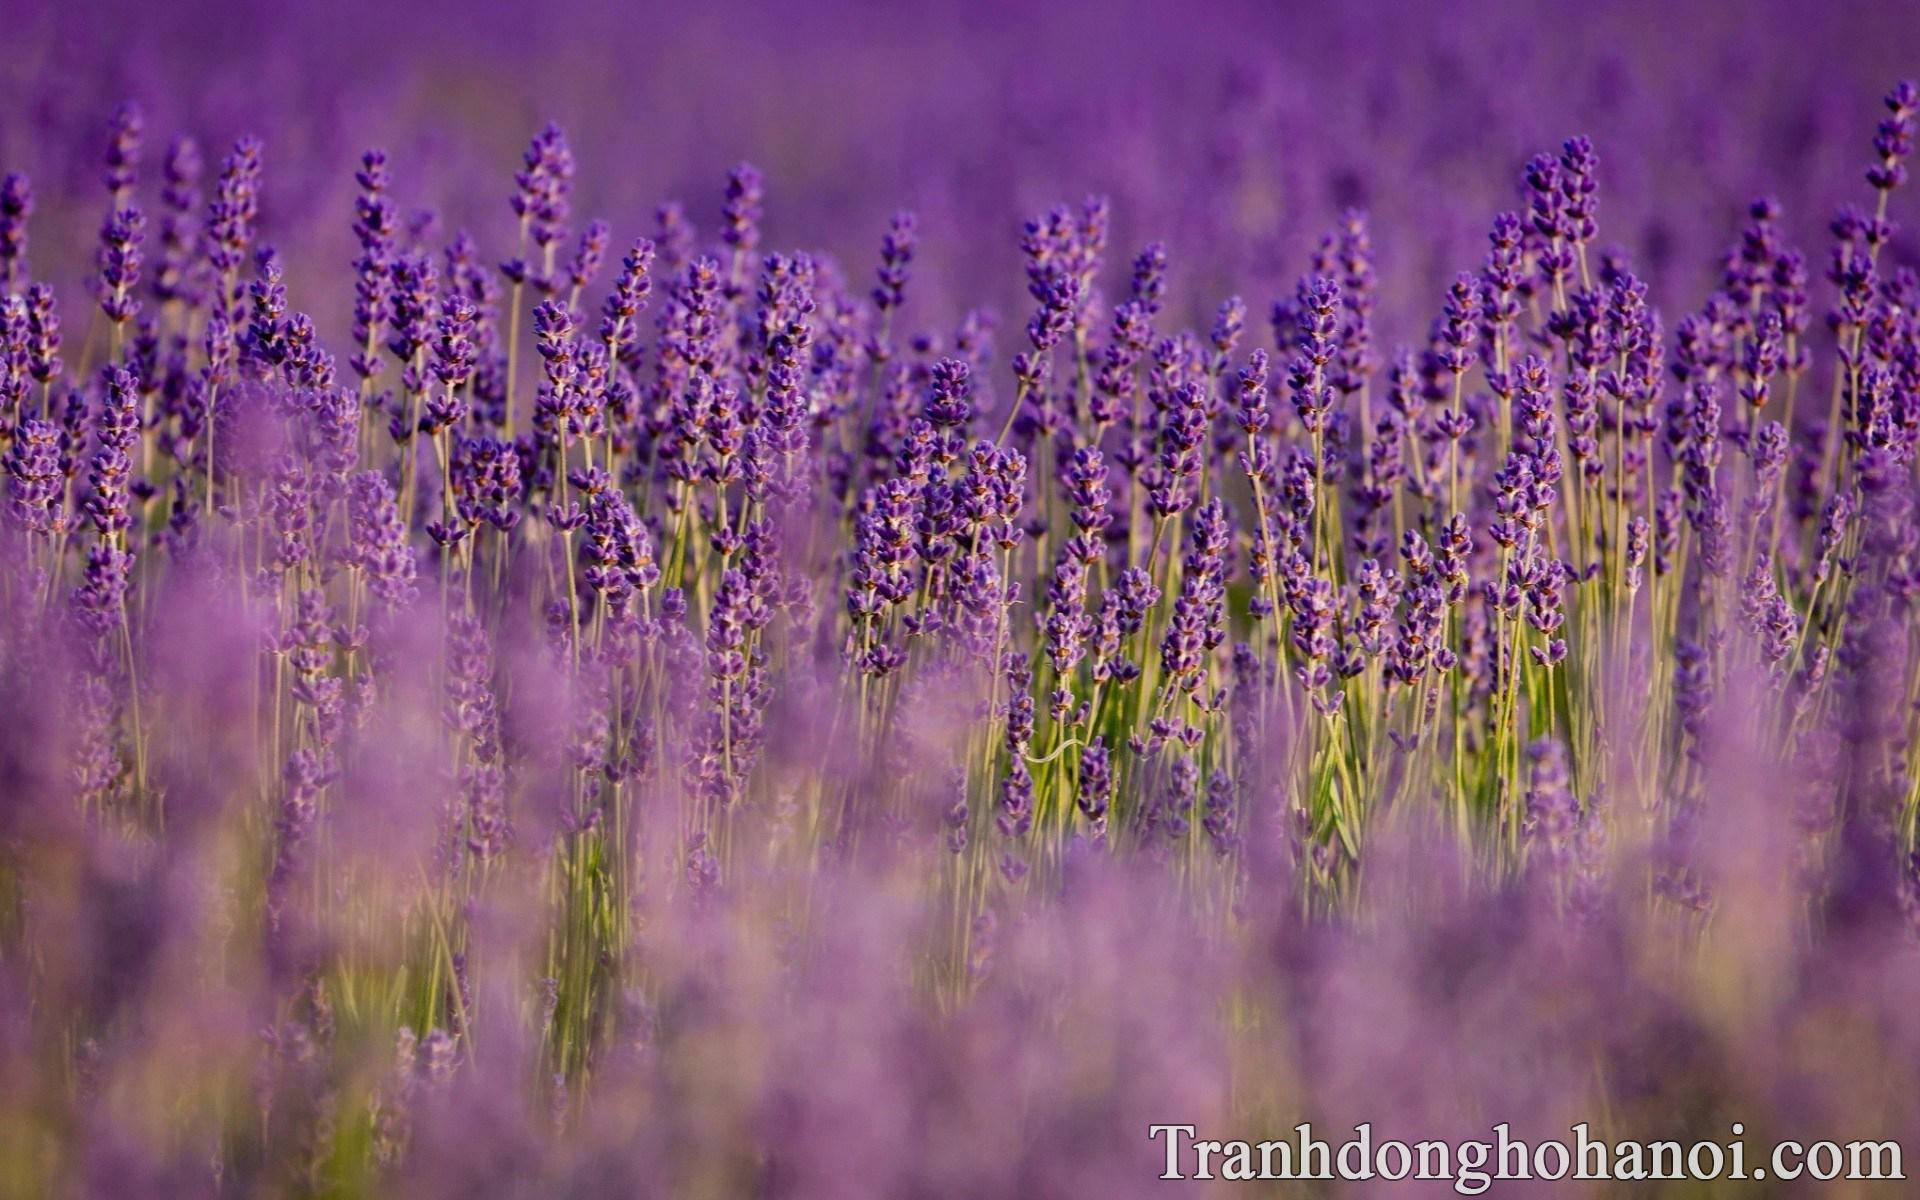 Anh hoa oai huong lavender dep tai mien phi